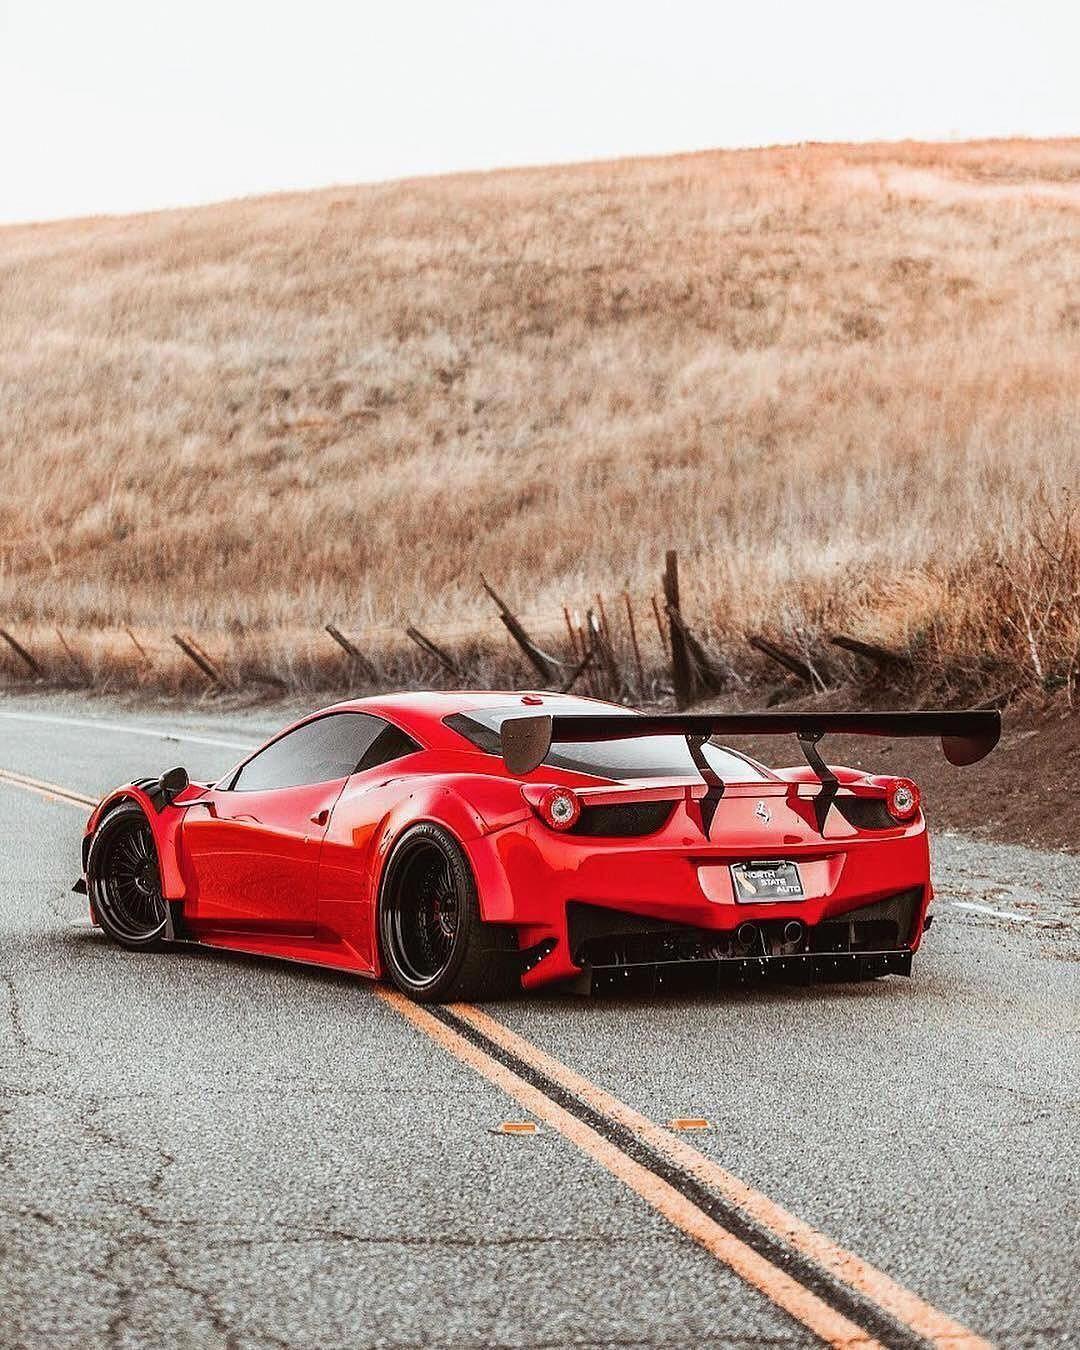 458 GT3!🔥   Photo by @nadeensparksvisuals   Owner @dannyp1818   #blacklist #ferrari #458 #458gt3 #luxurycars Ferrari (Феррари) - мечта любого мужчины! Ferrari (Феррари) - мечта любого мужчины!